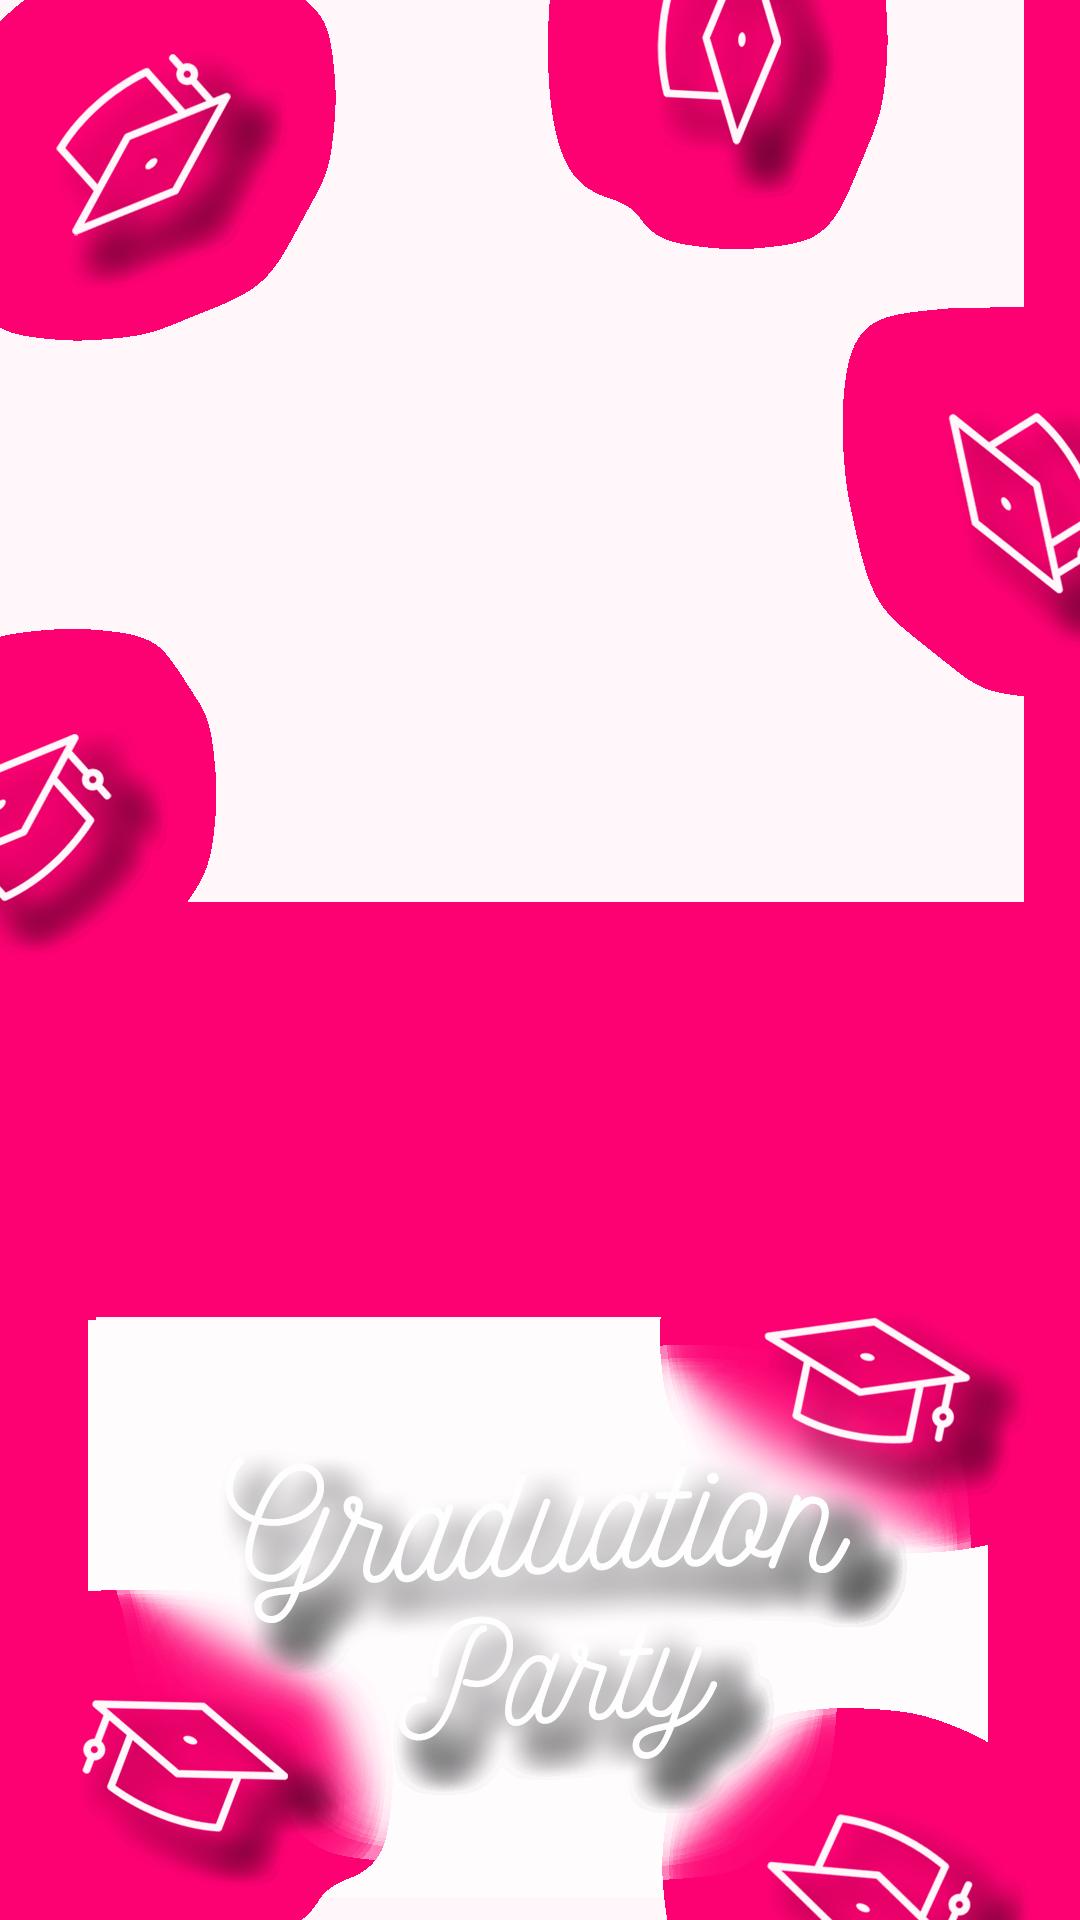 Neon graduation snapchat filter geofilter maker on filterpop for Snapchat filters maker